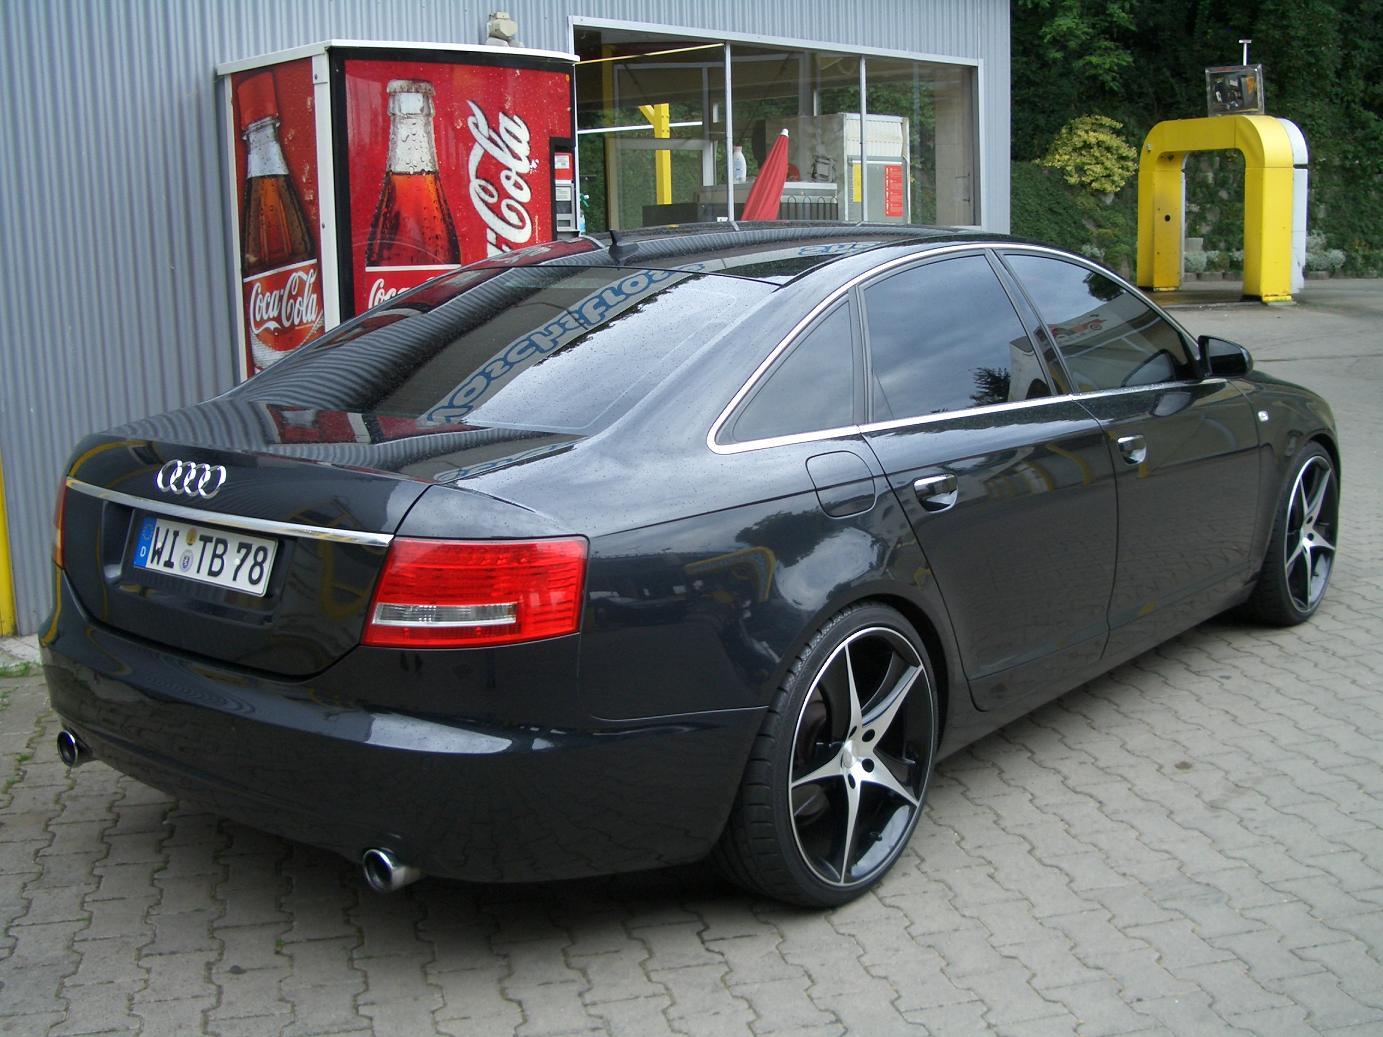 Kekurangan Audi A6 Quattro 3.0 Tdi Spesifikasi